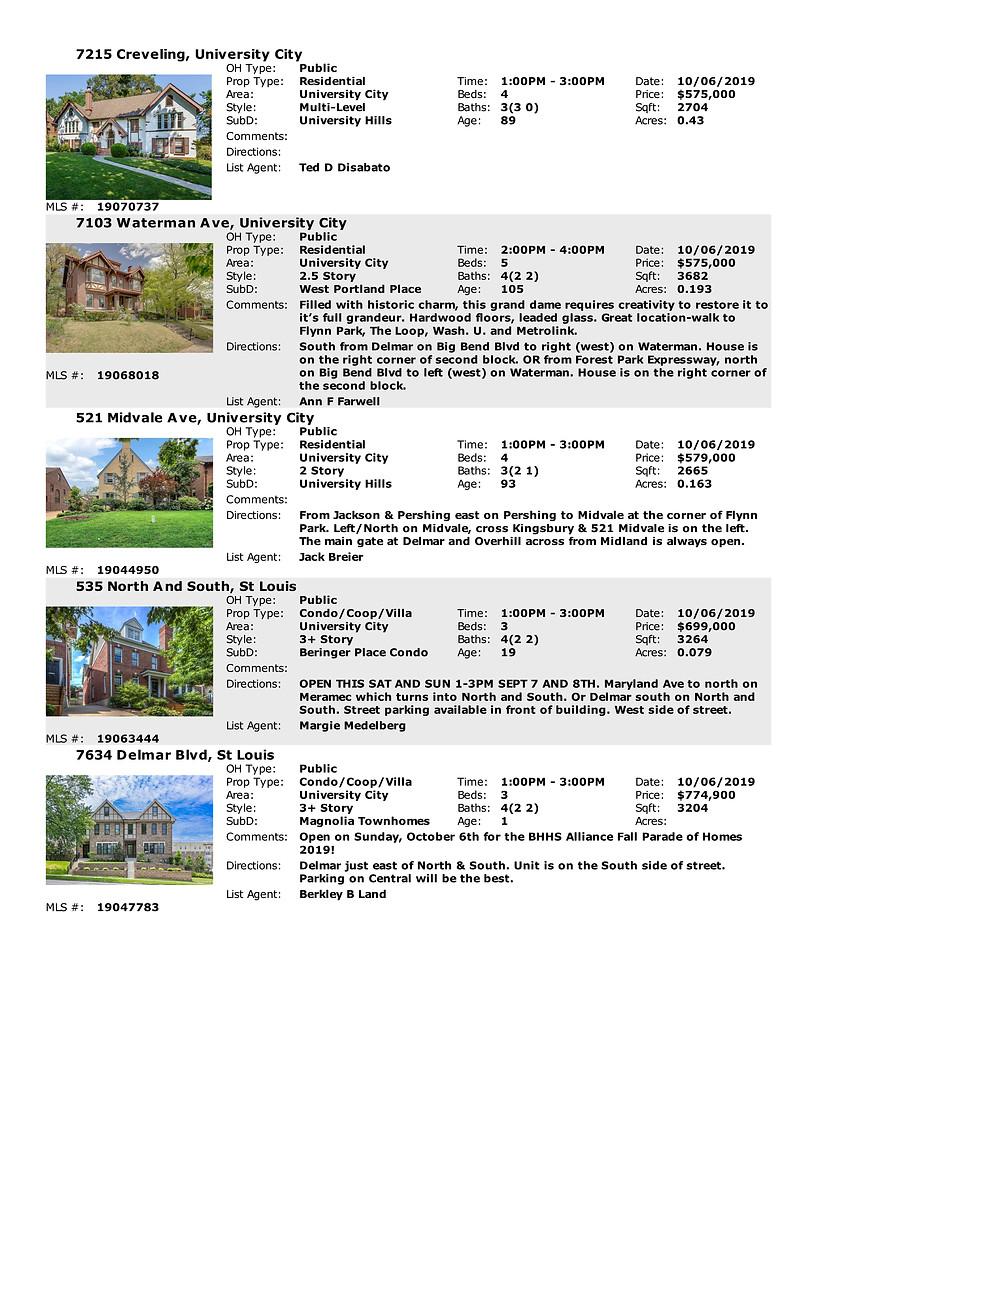 University City Open Houses